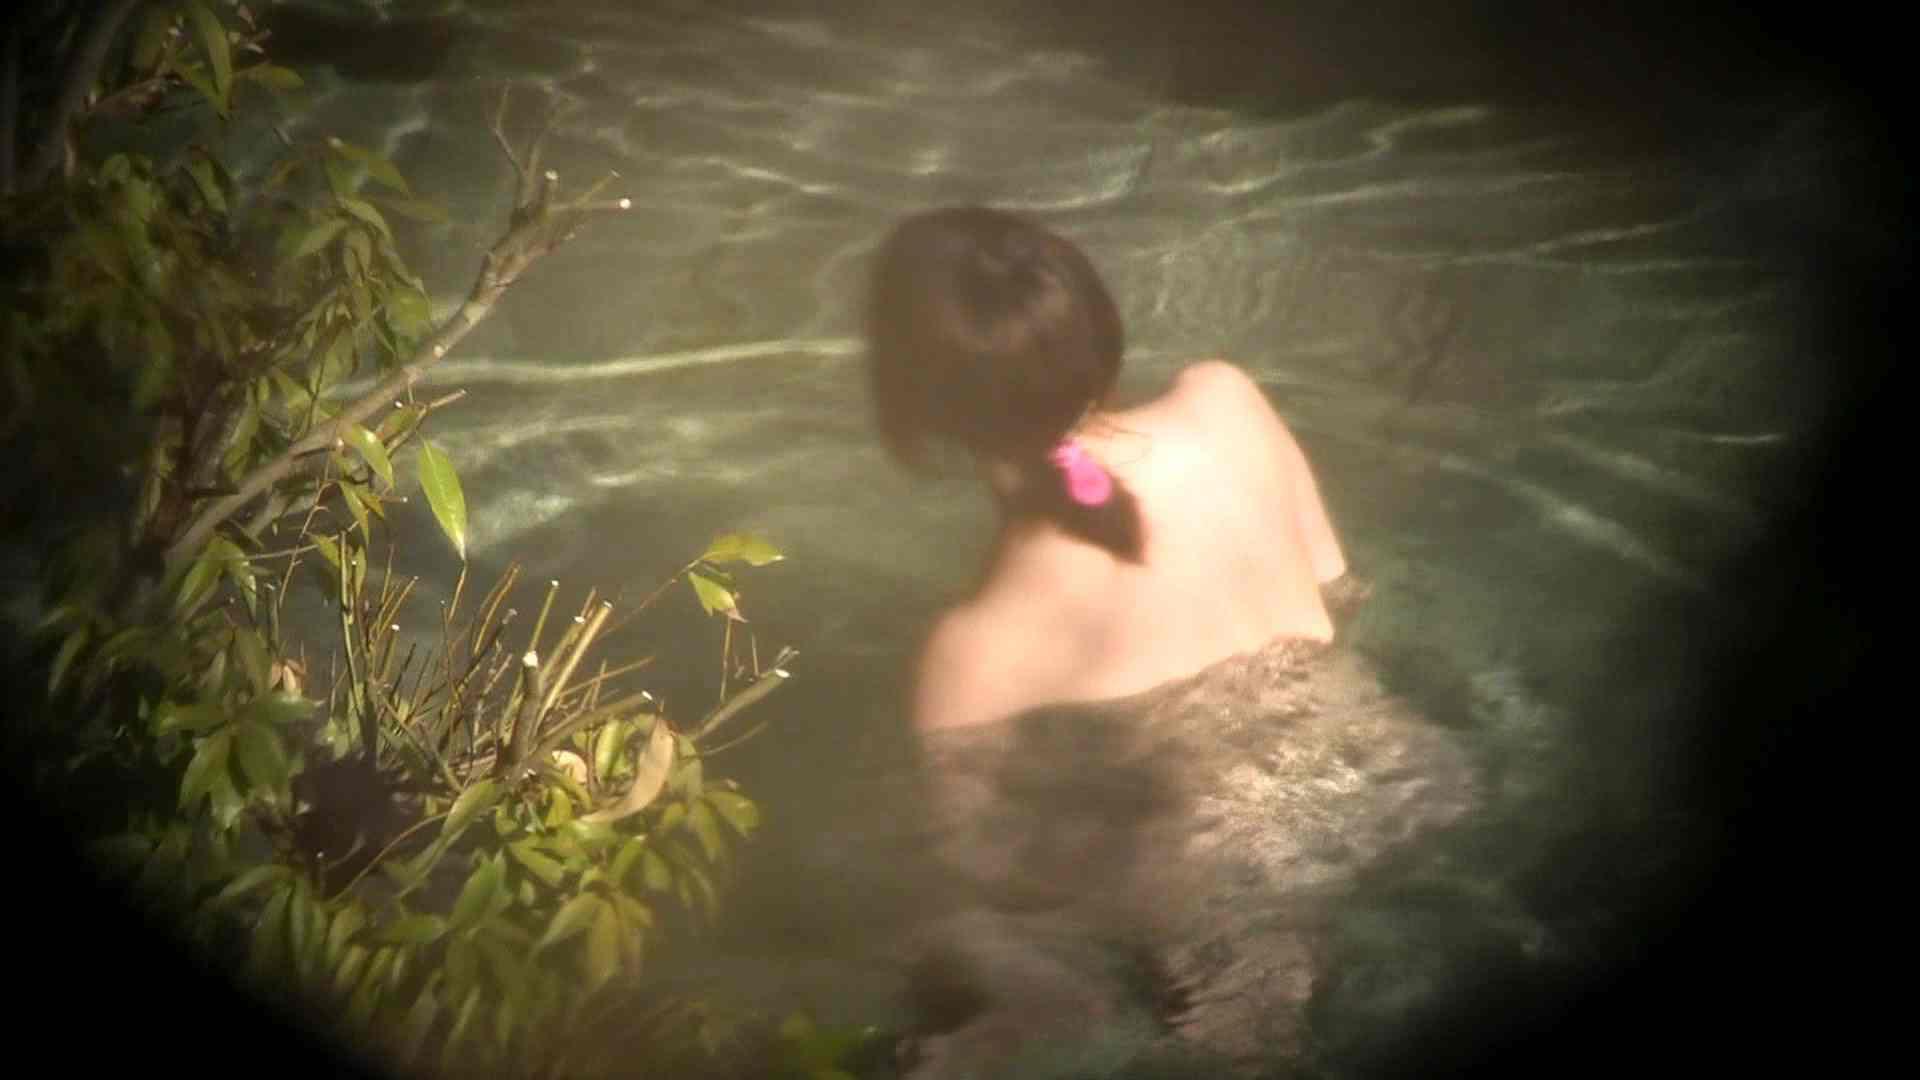 Aquaな露天風呂Vol.698 美しいOLの裸体 われめAV動画紹介 104pic 44